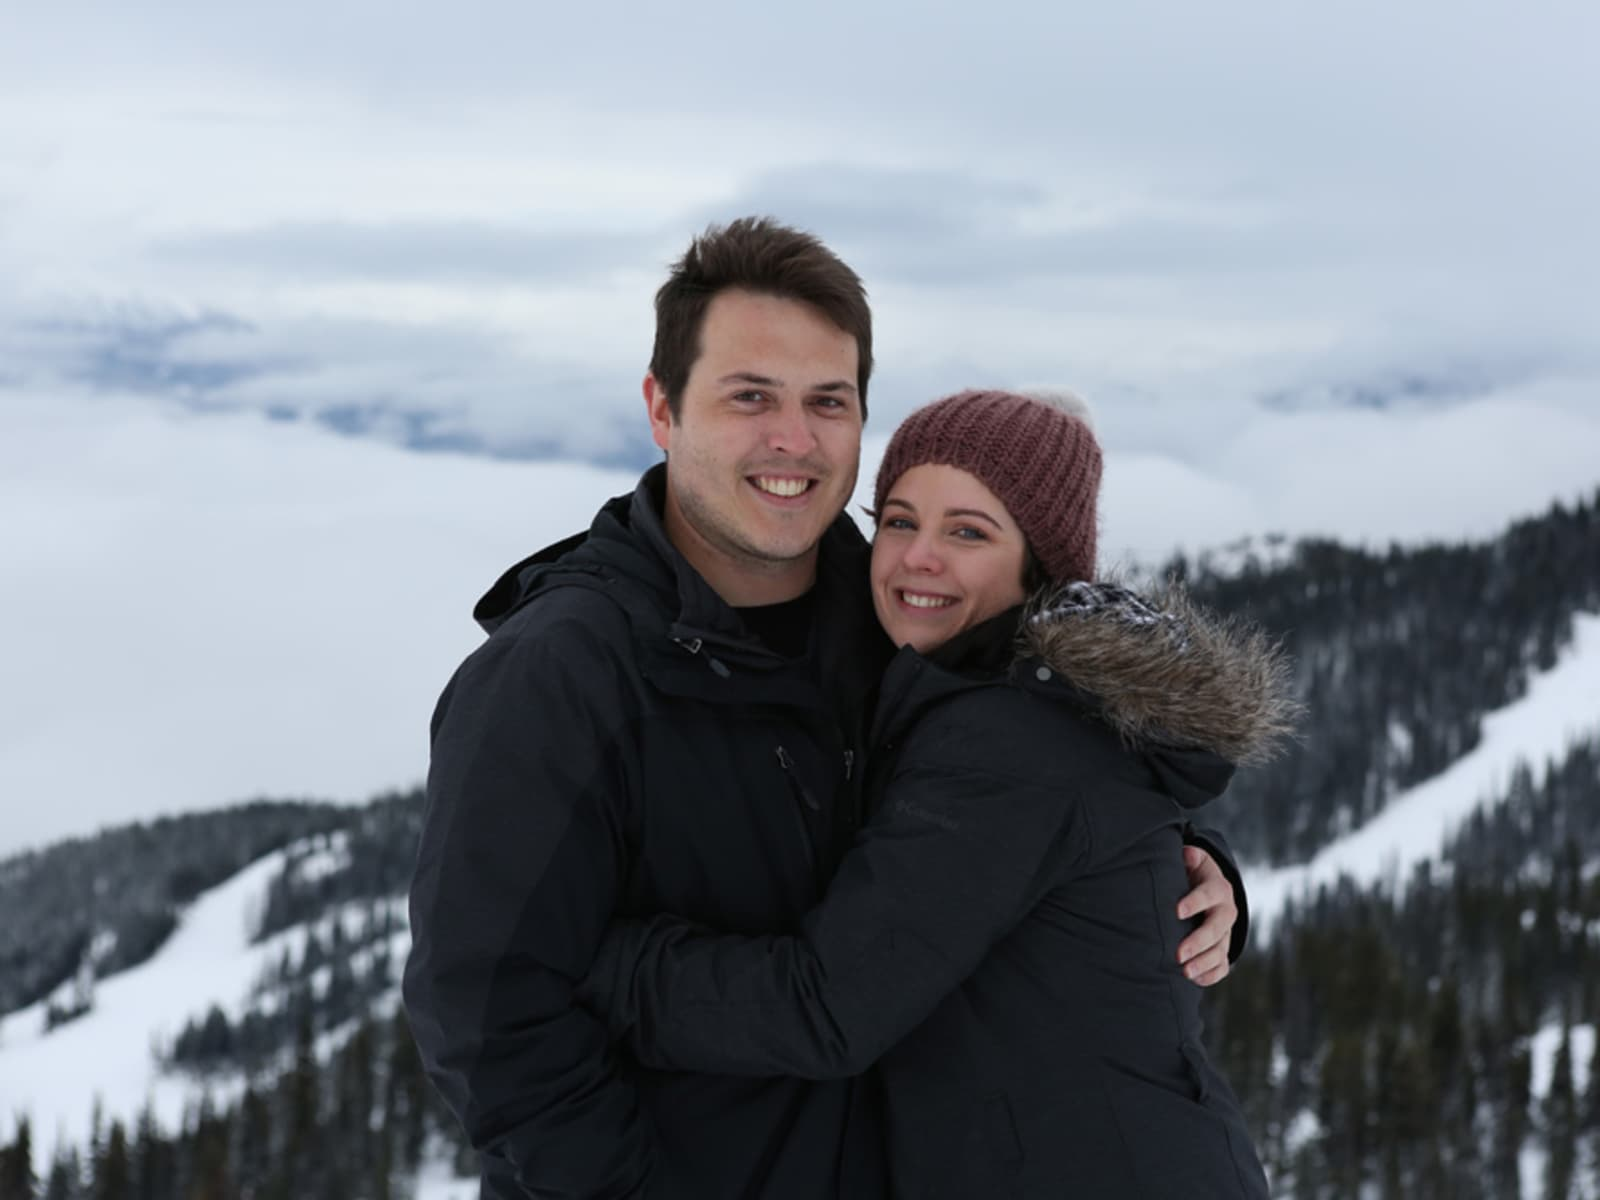 Rebekah & Joshua from Bundaberg, Queensland, Australia